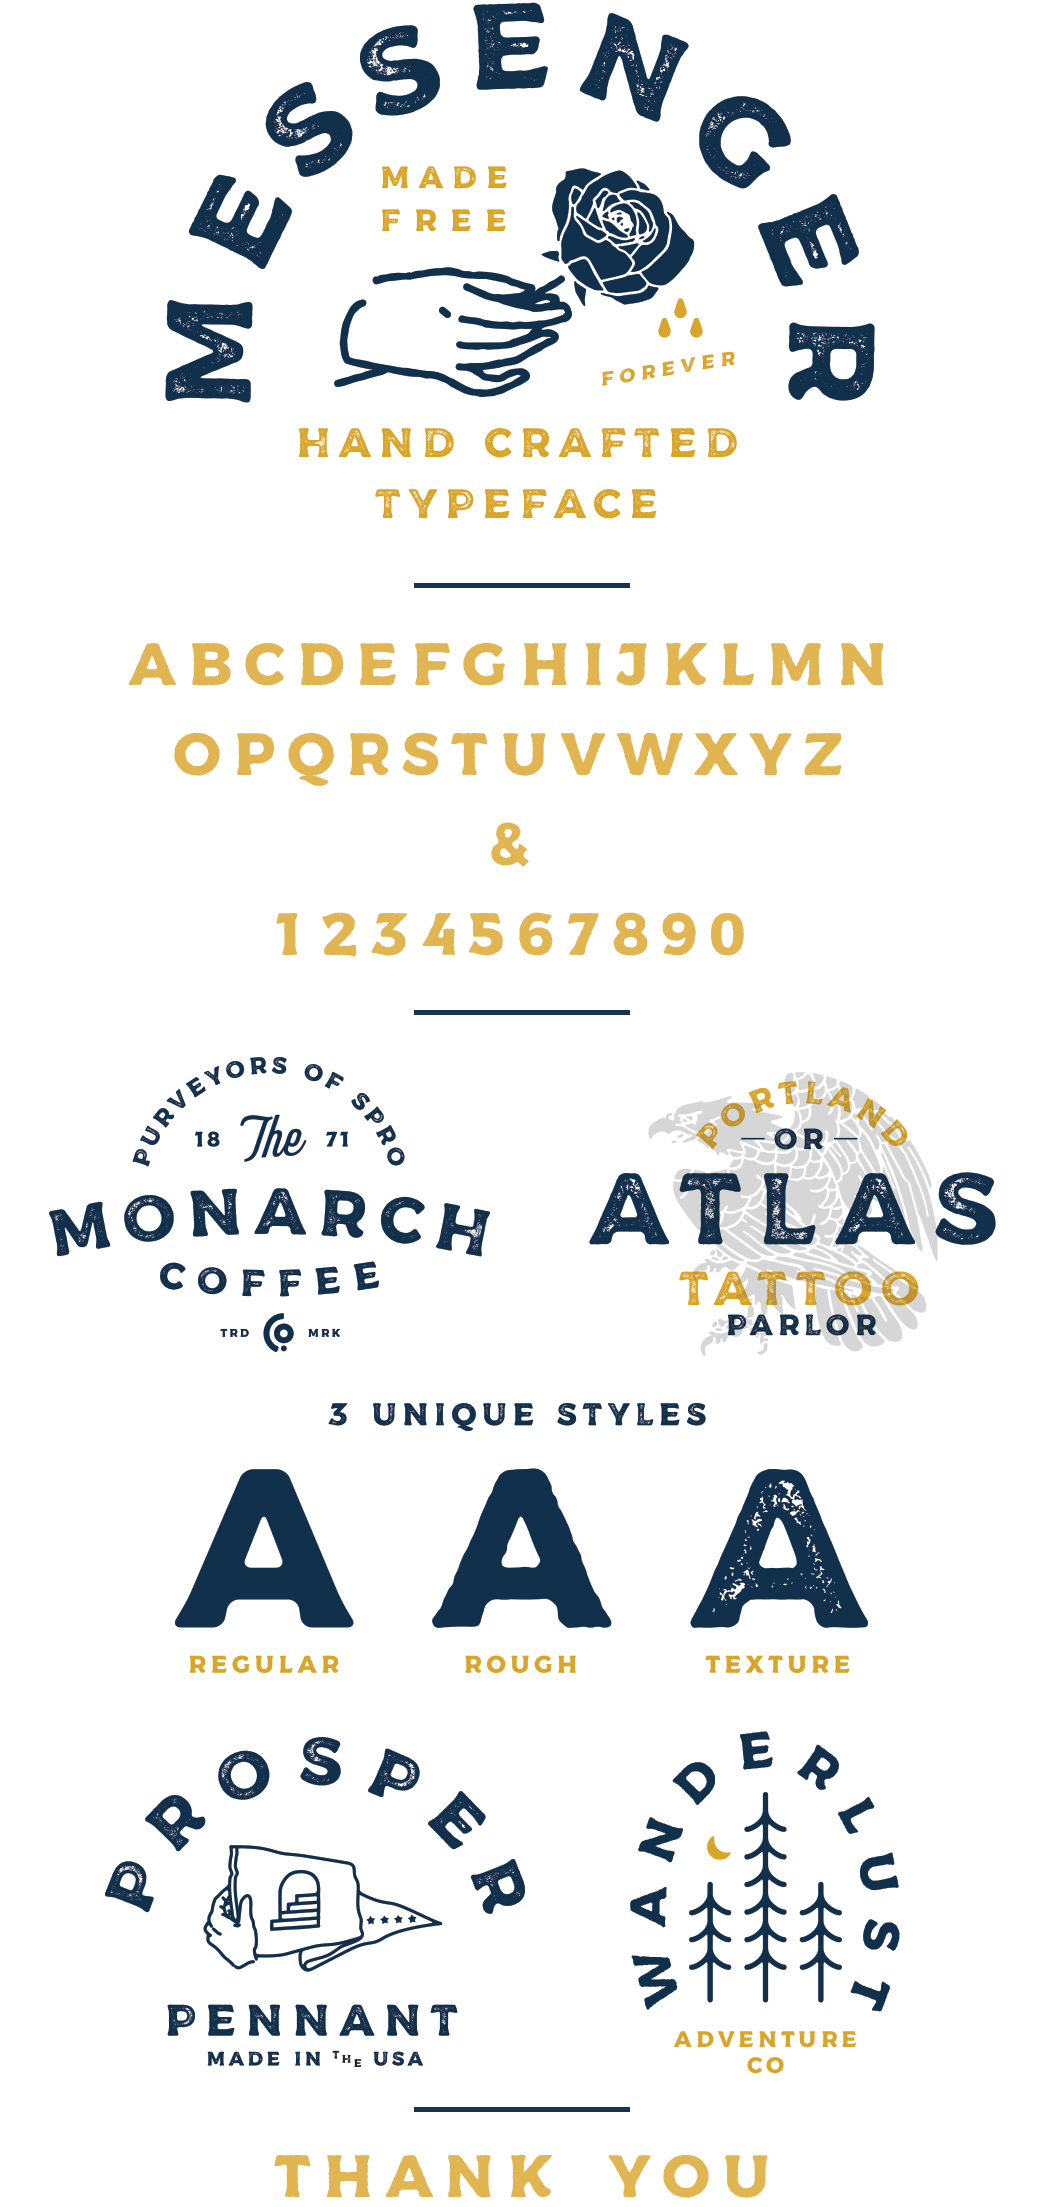 messenger创意logo设计英文字体下载